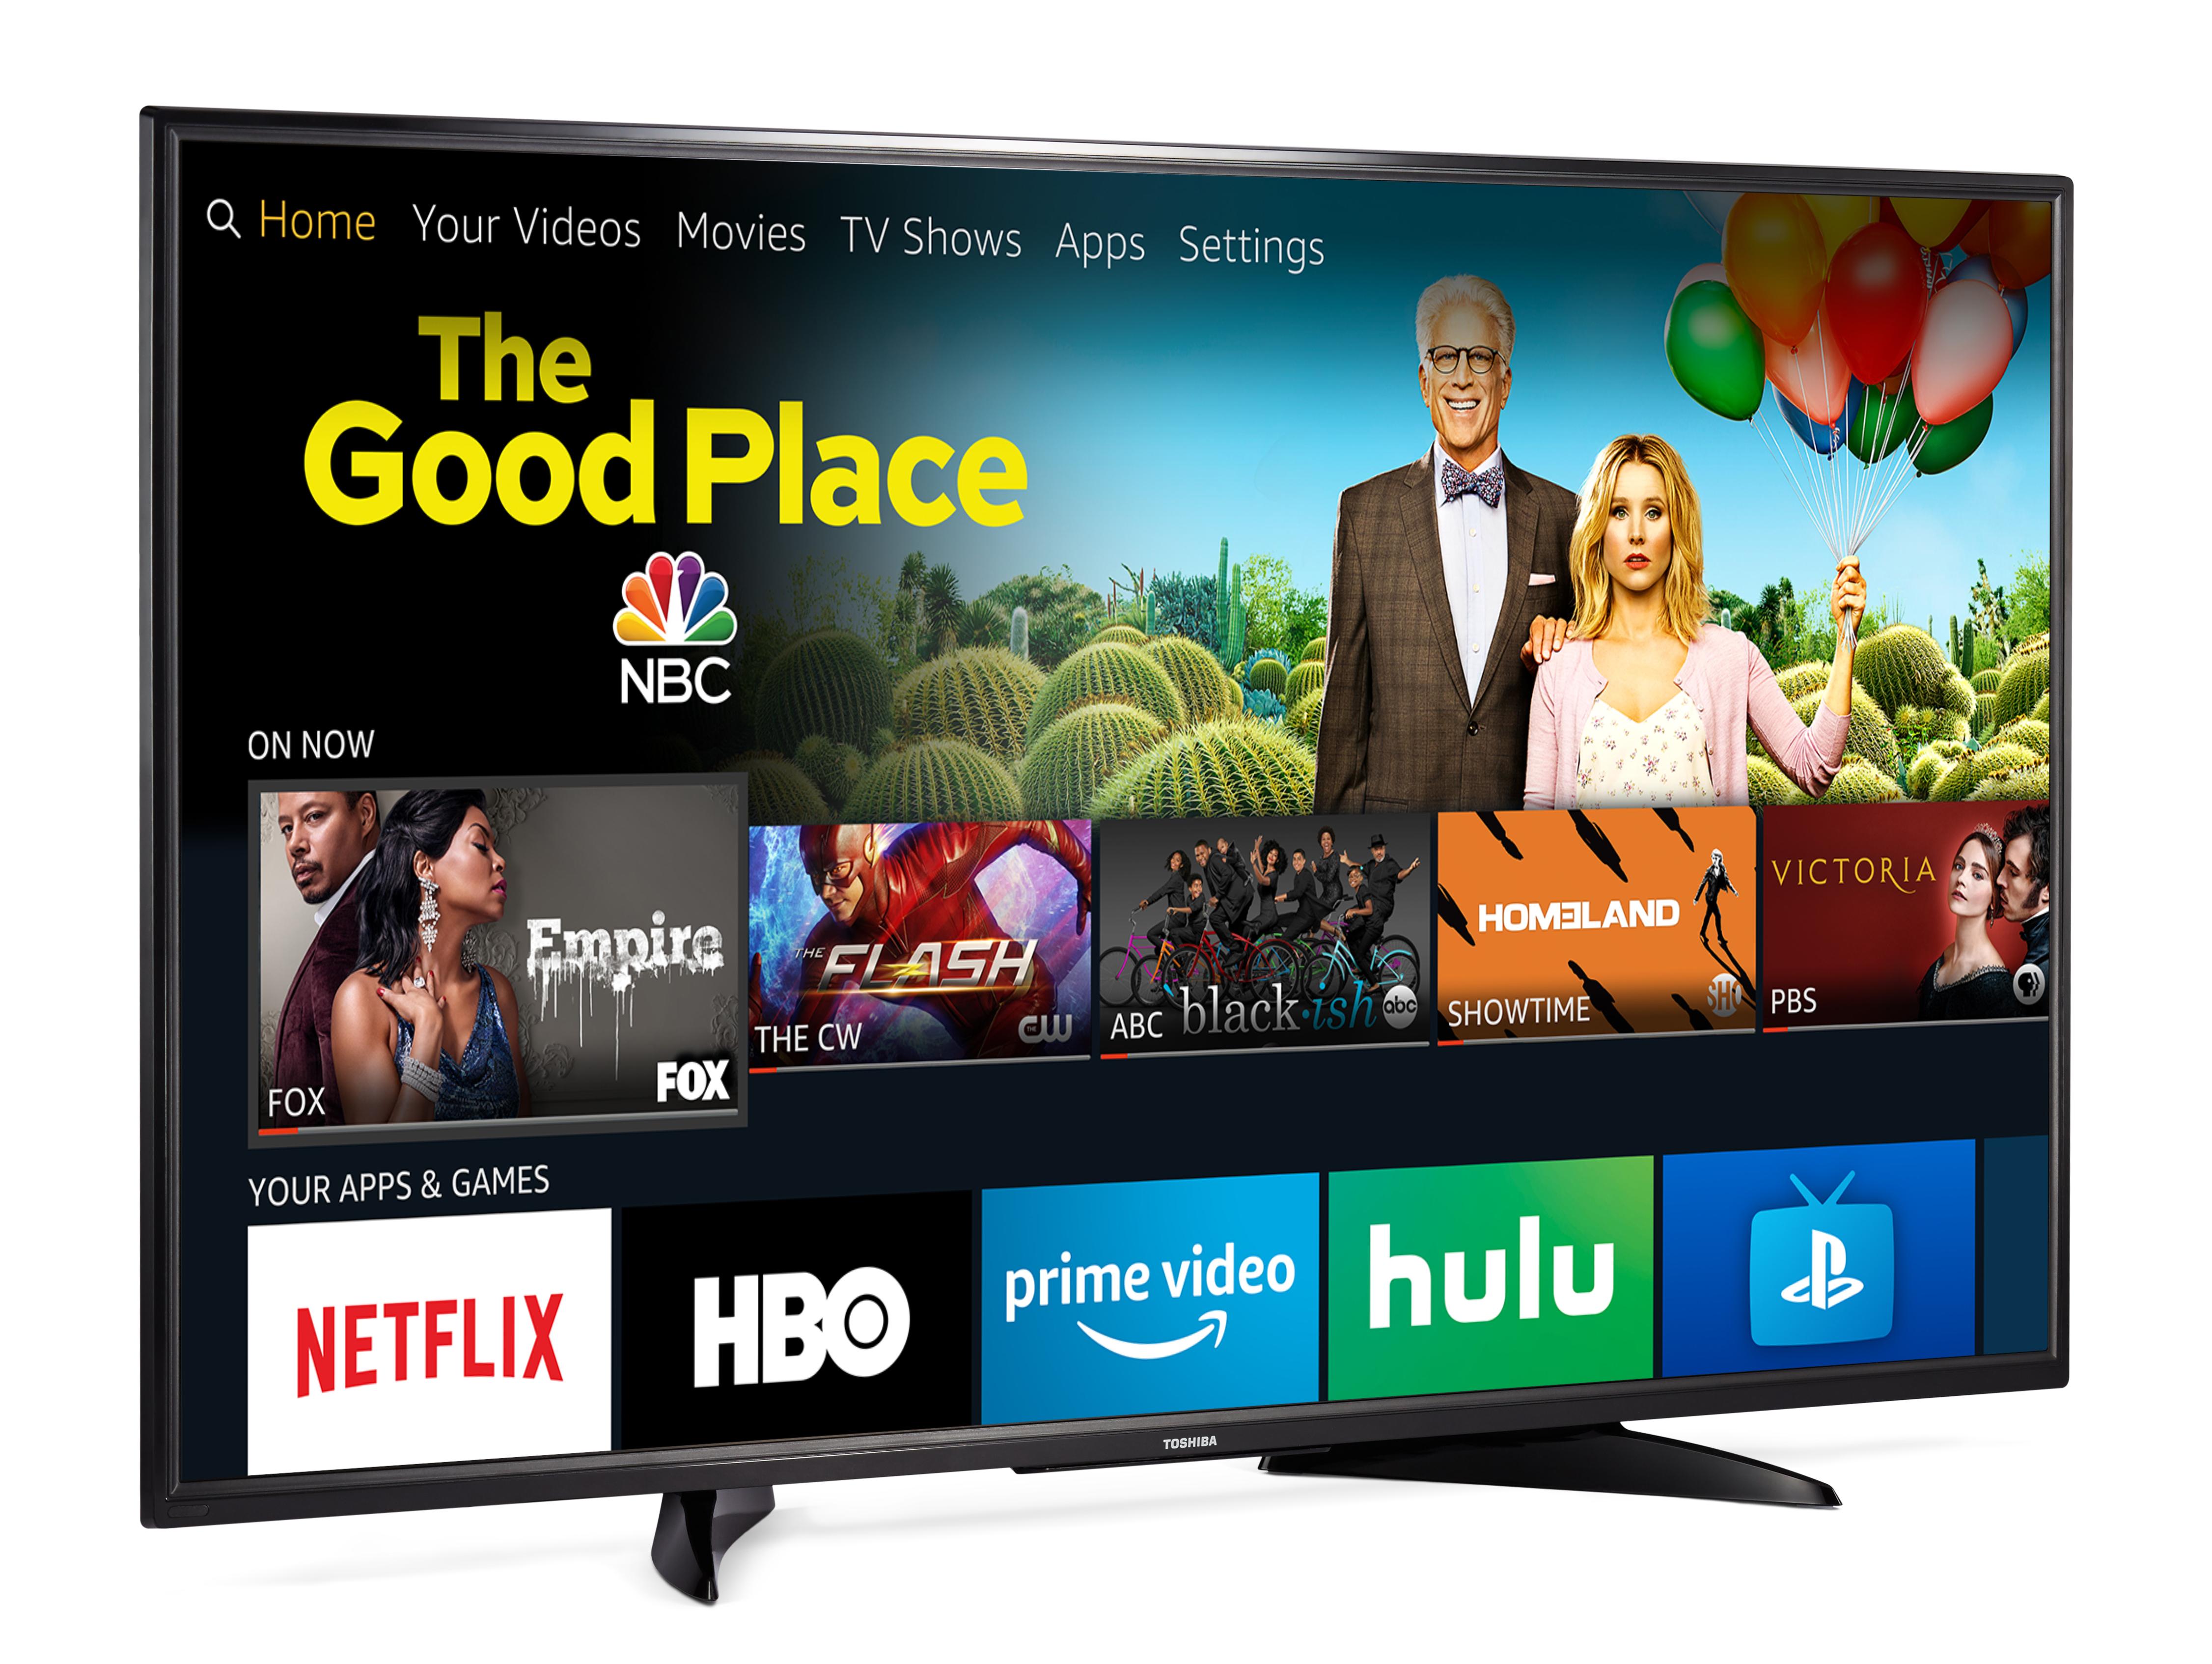 Toshiba Amazon Fire TV Edition smart TV